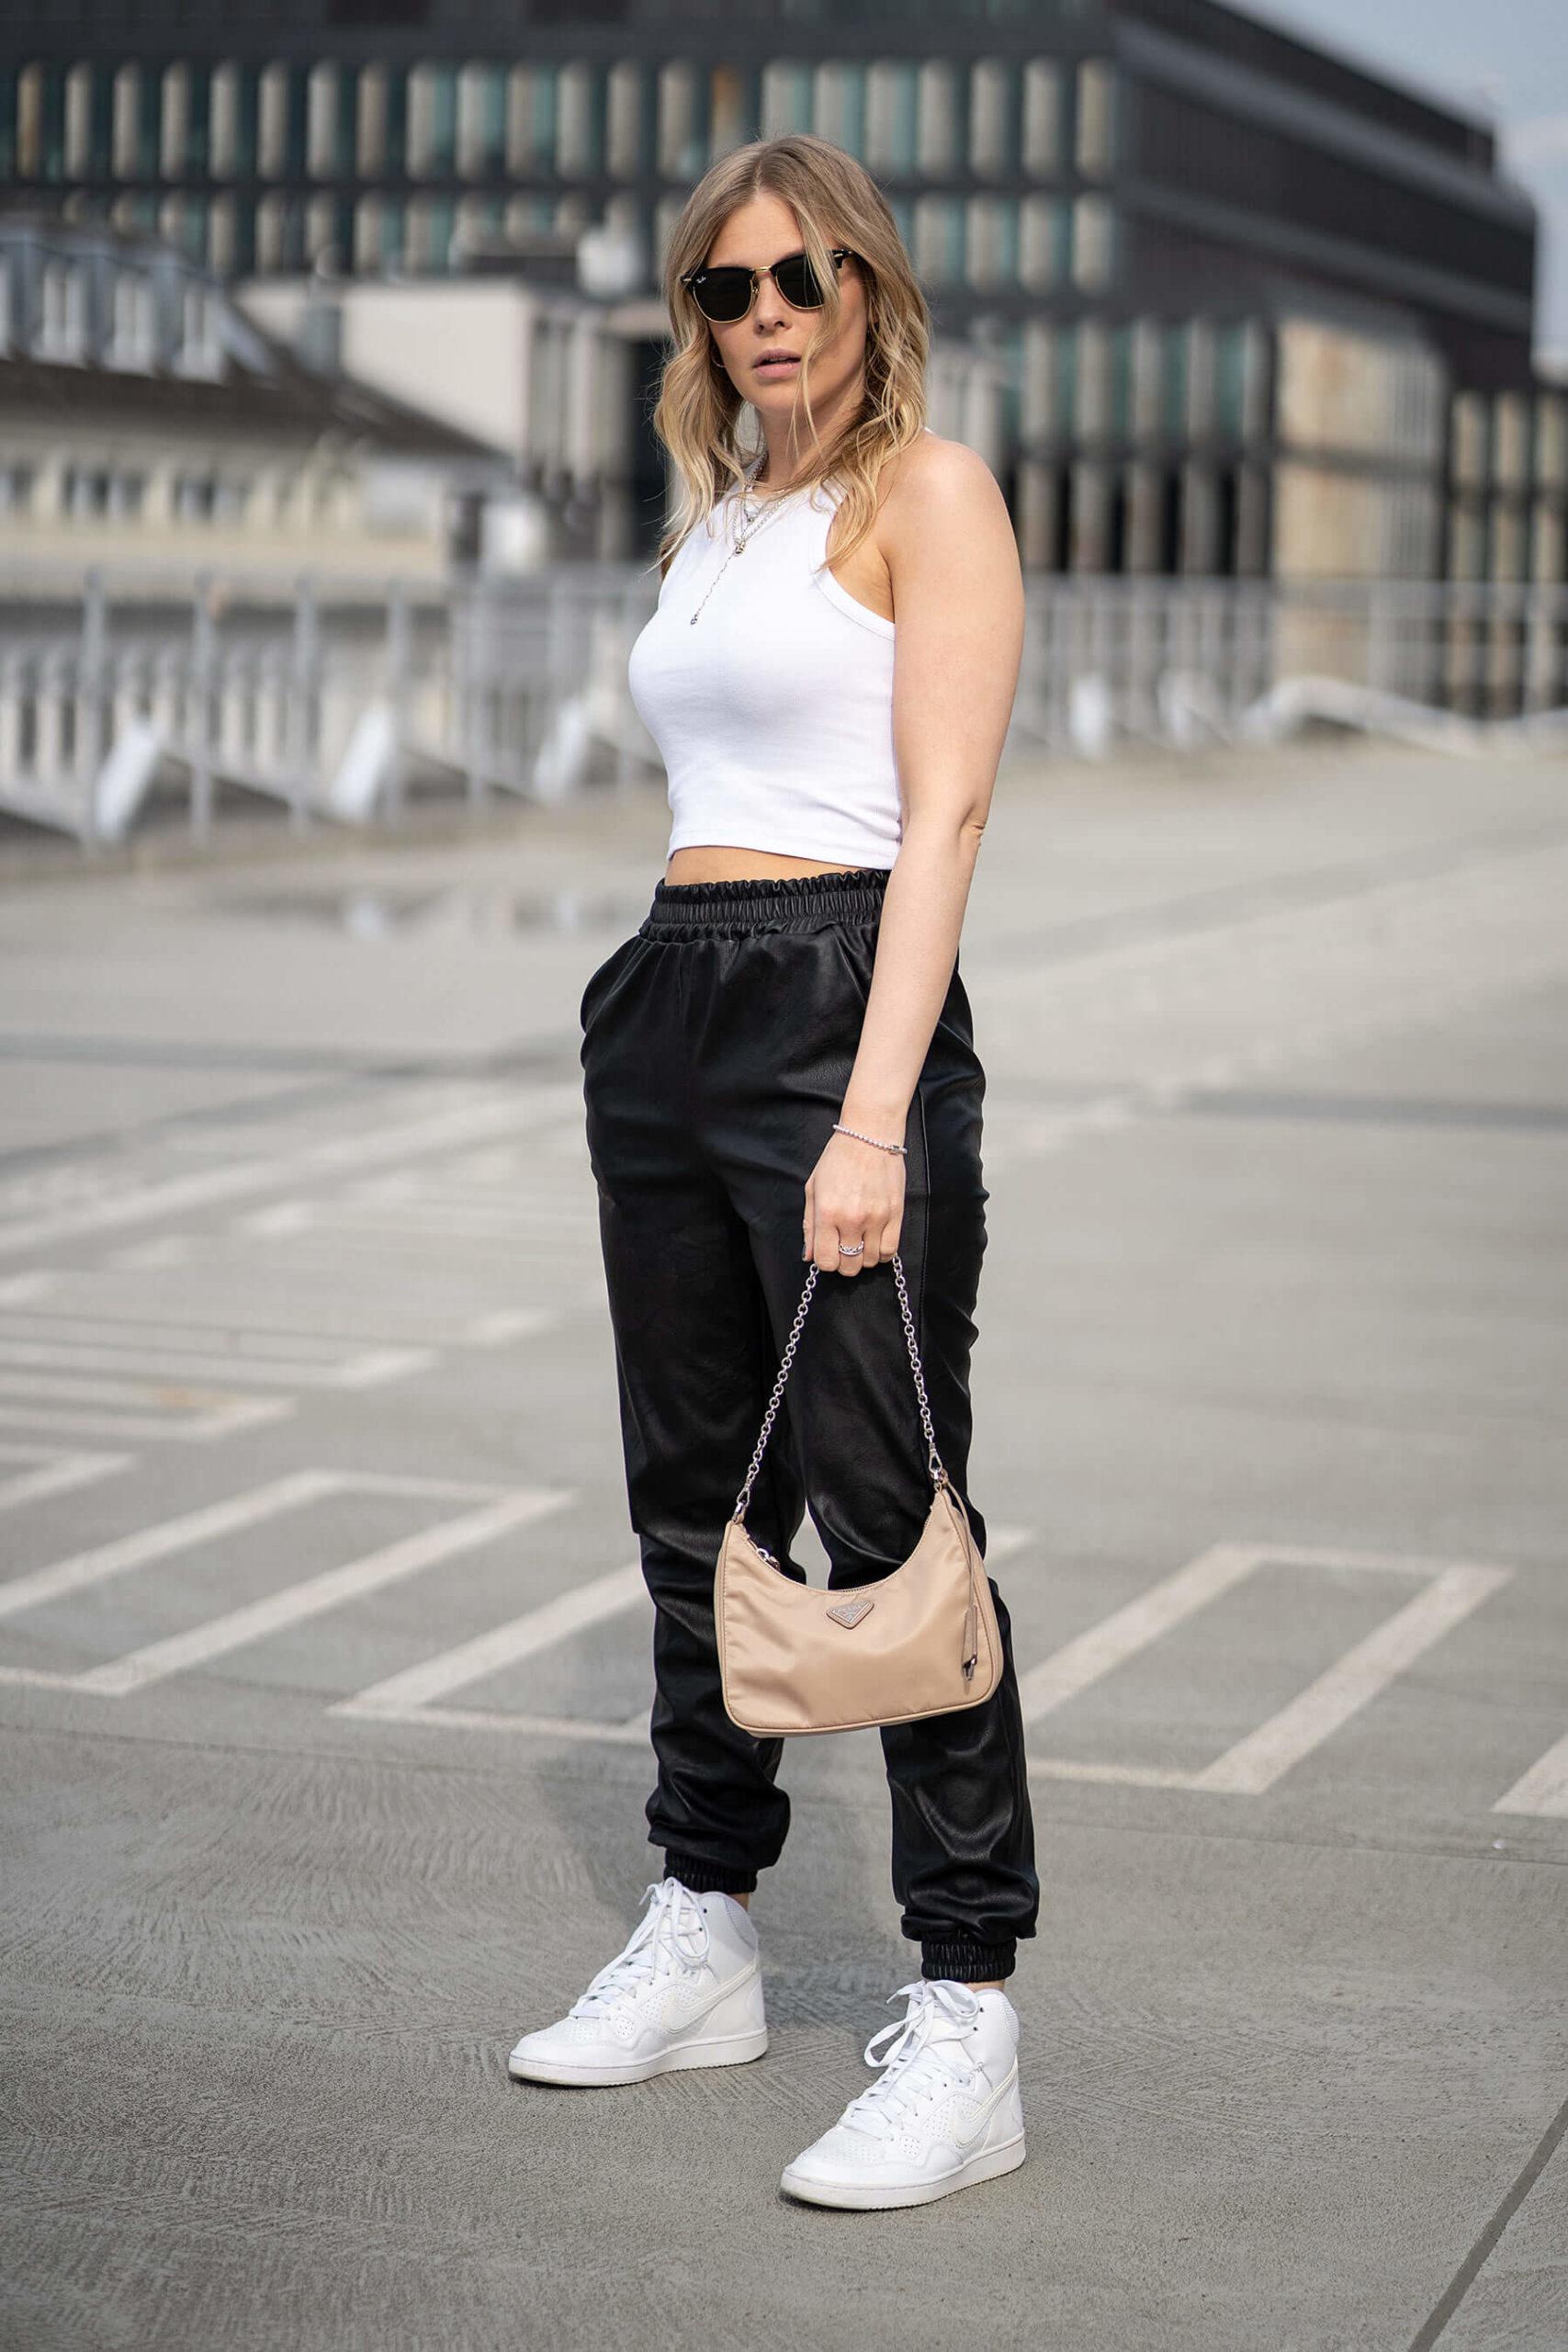 fashion blogger inga brauer düsseldorf streetstyle outfit tank top